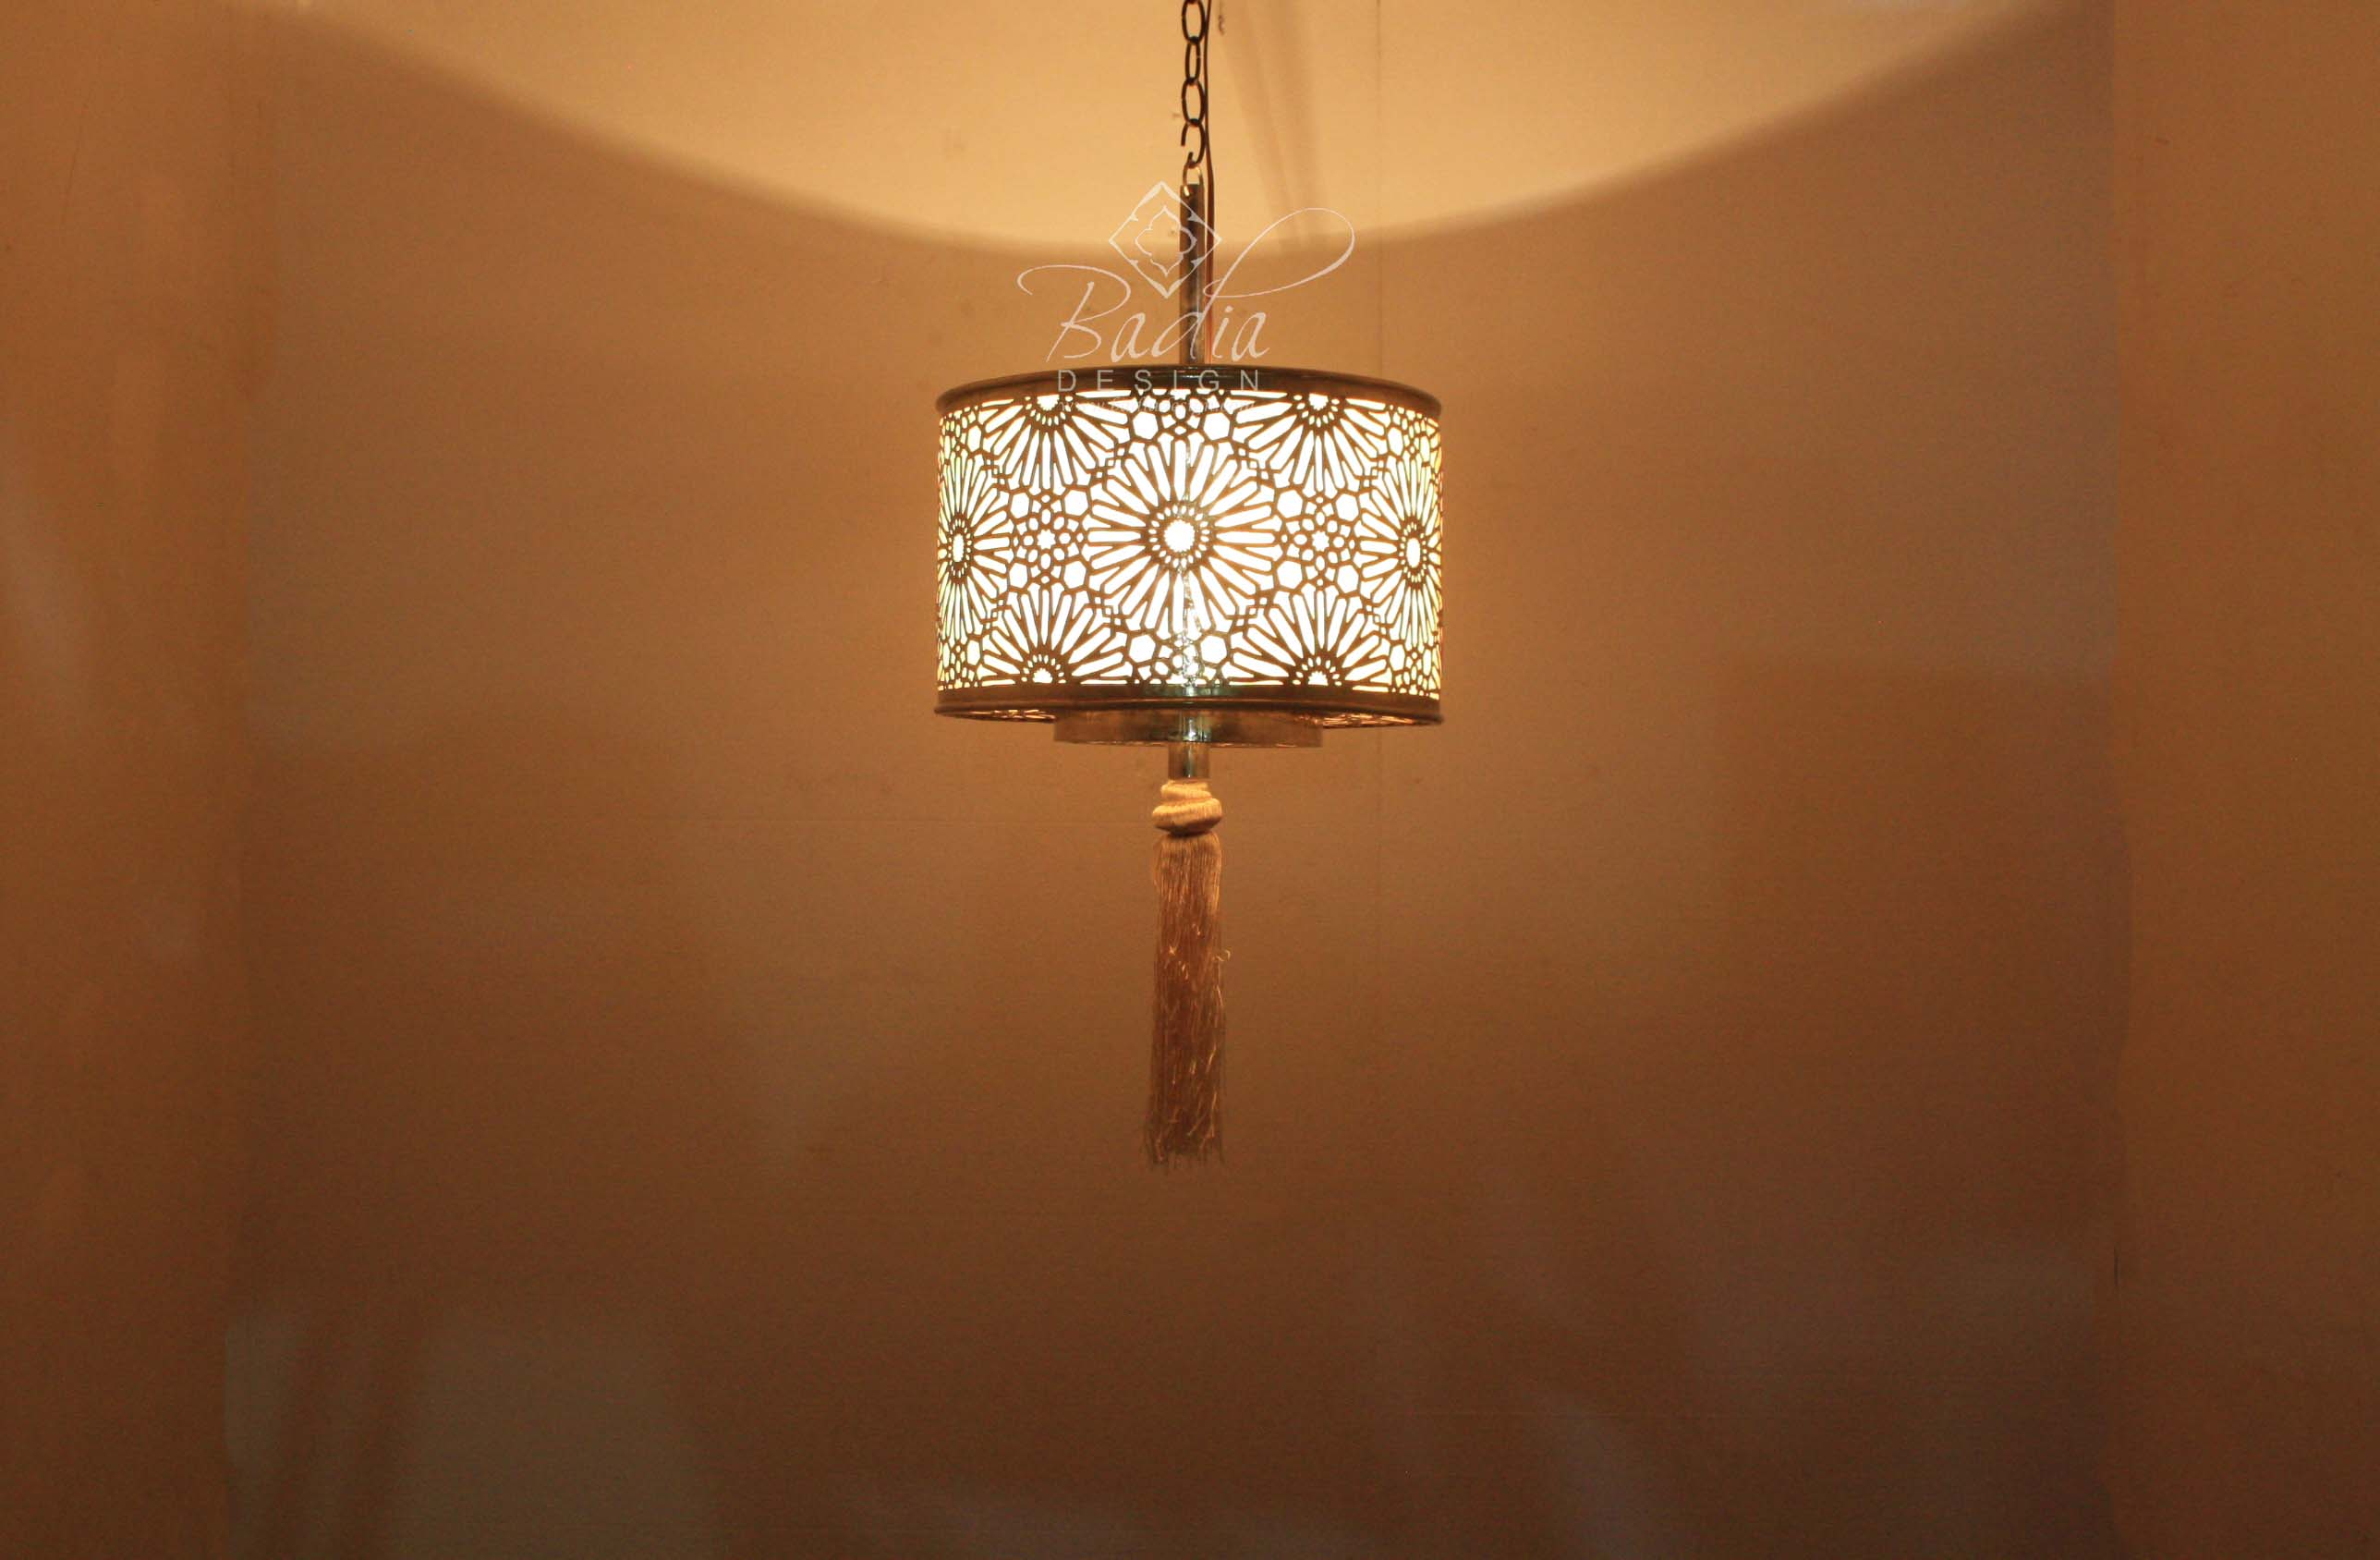 moroccan-hanging-lanterns-los-angles-lig367-2b.jpg